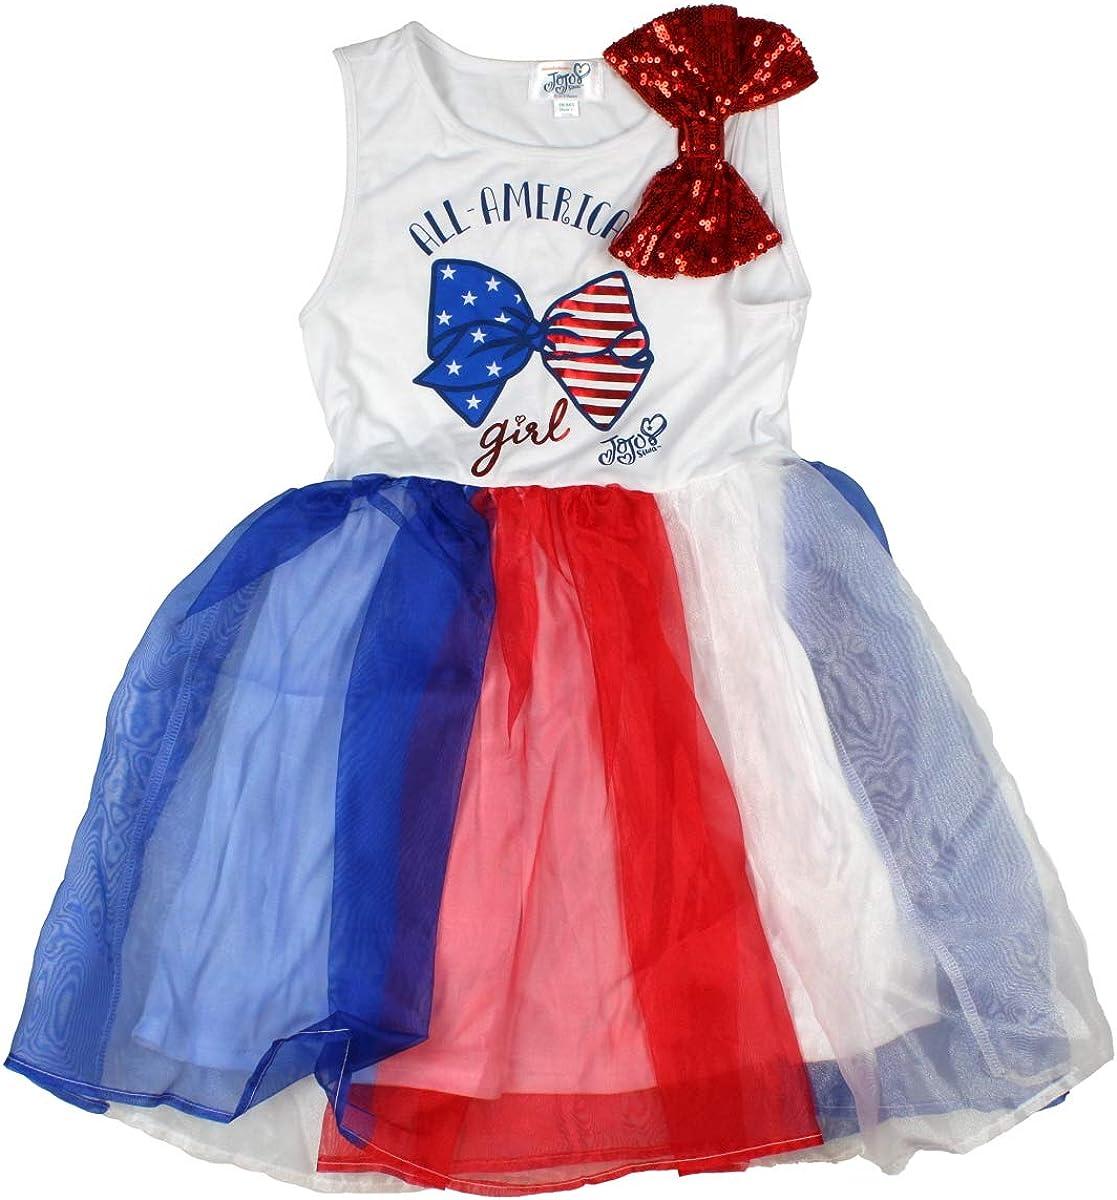 Seven Times Six JoJo Closet Girls' All America Bow Girl Sleeveless Tutu Dress